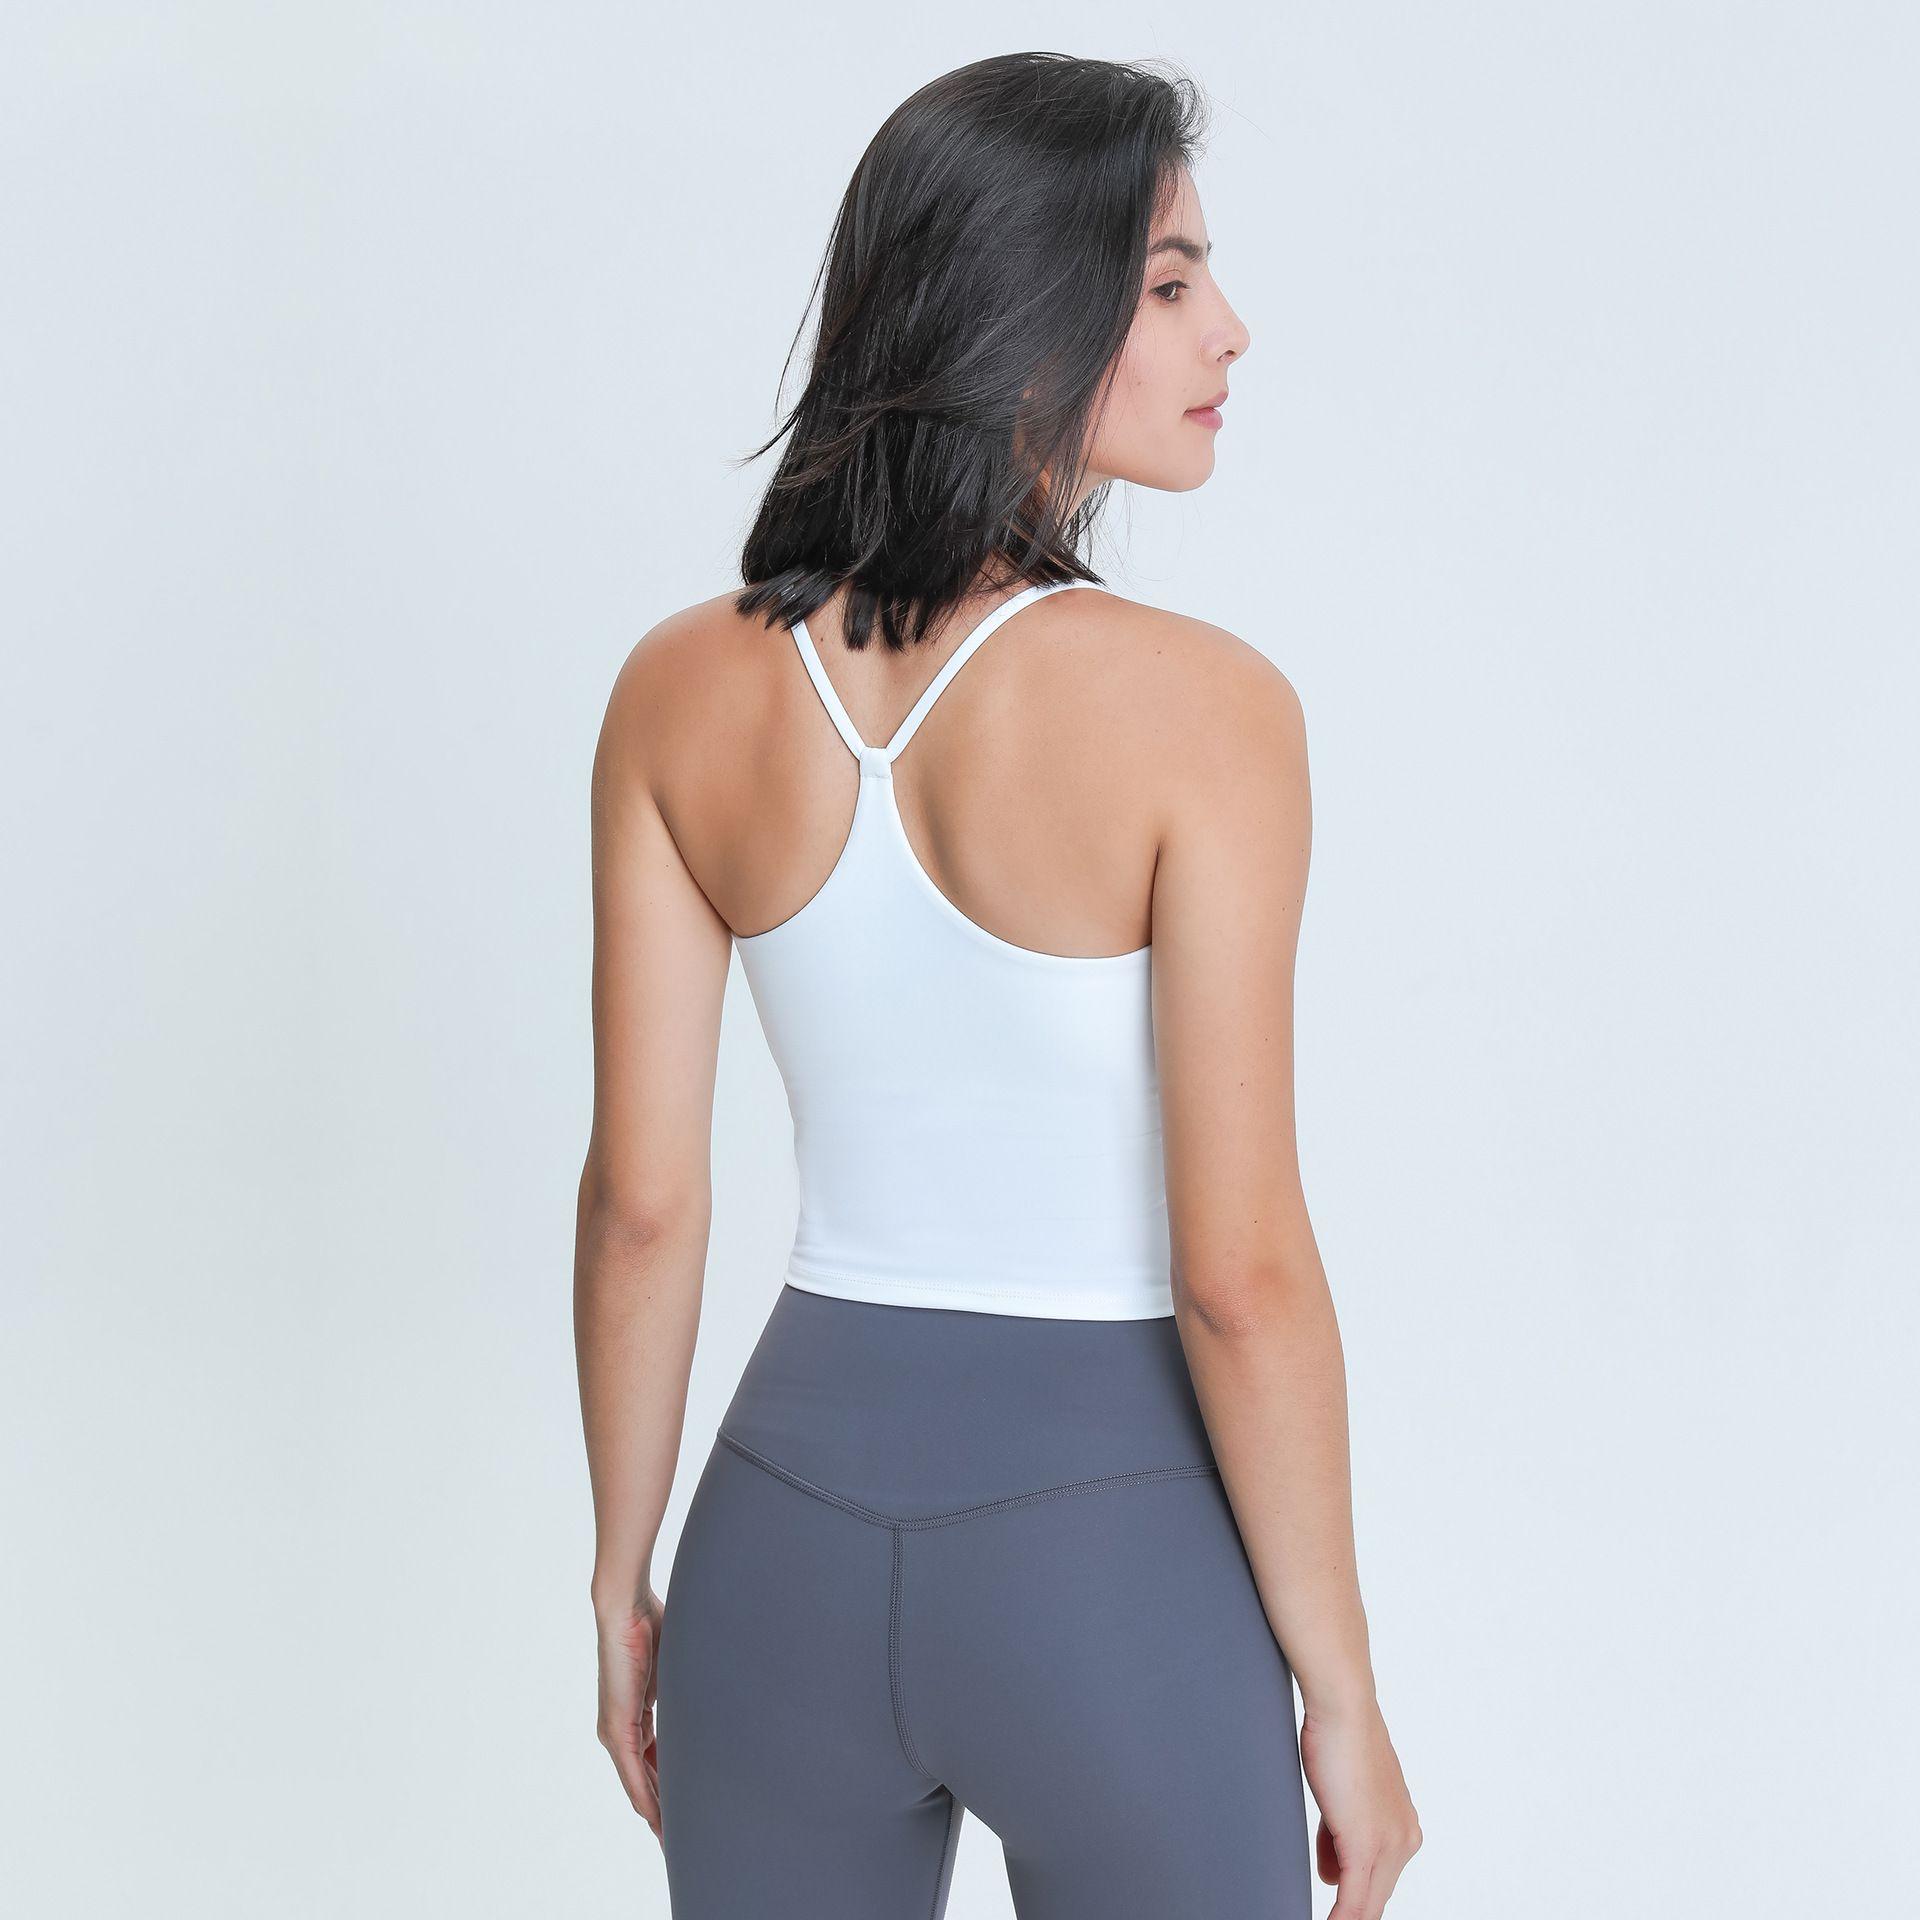 L-97 Tank canotte da donna per allenamenti yoga Fitness Sport Camicie Sexy Gilet Quick Dry Sustosible Gym Tops Shape Shape Soft New Slim Fit T-shirt